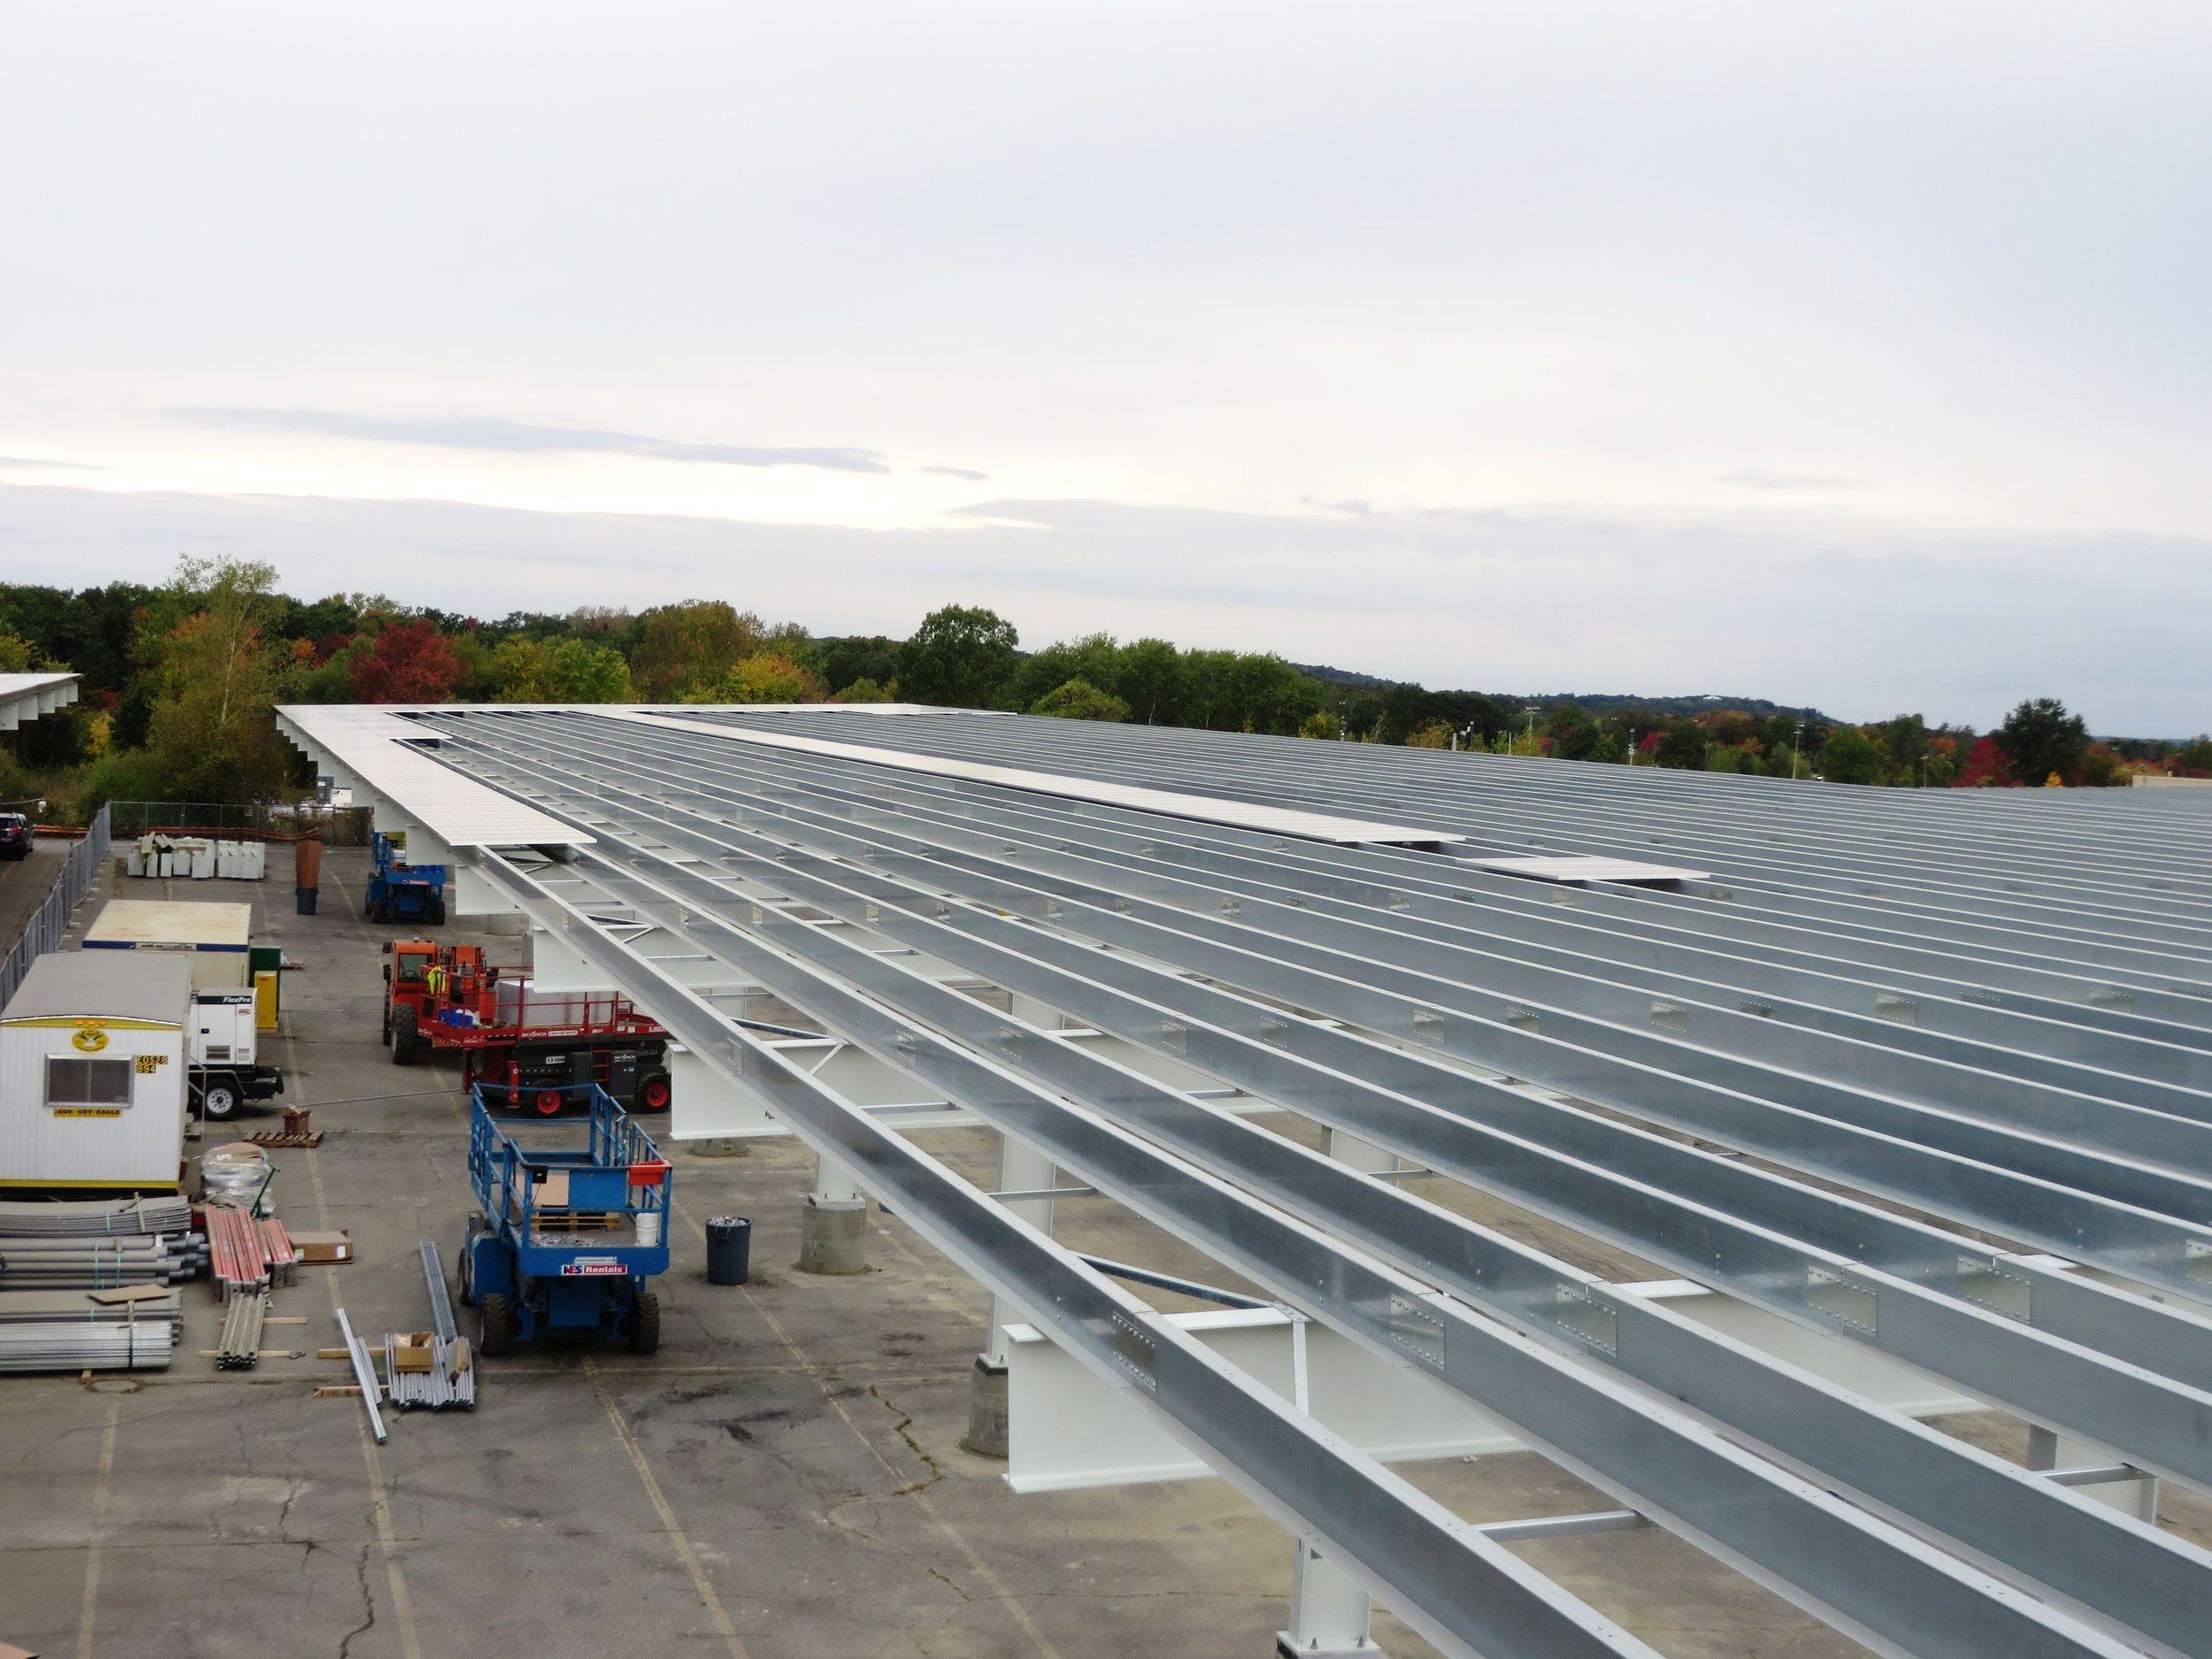 Adesa 4 23 Mw Carport Canopy Solar Array William Bliss Iii Carport Canopy Solar Canopy